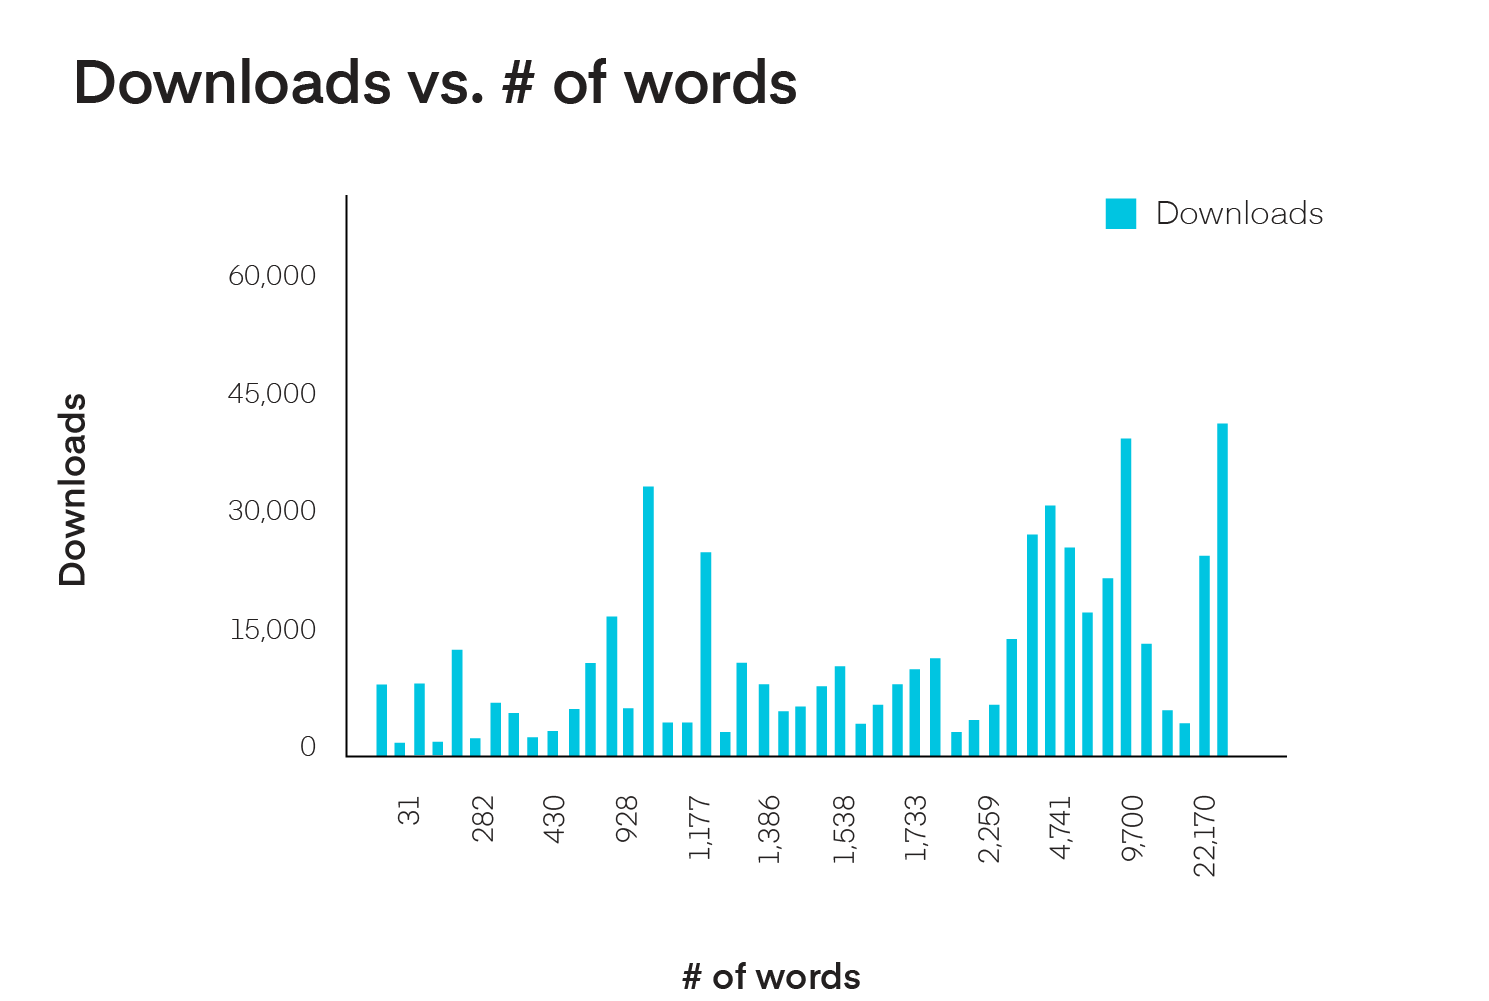 Bar chart of downloads vs words